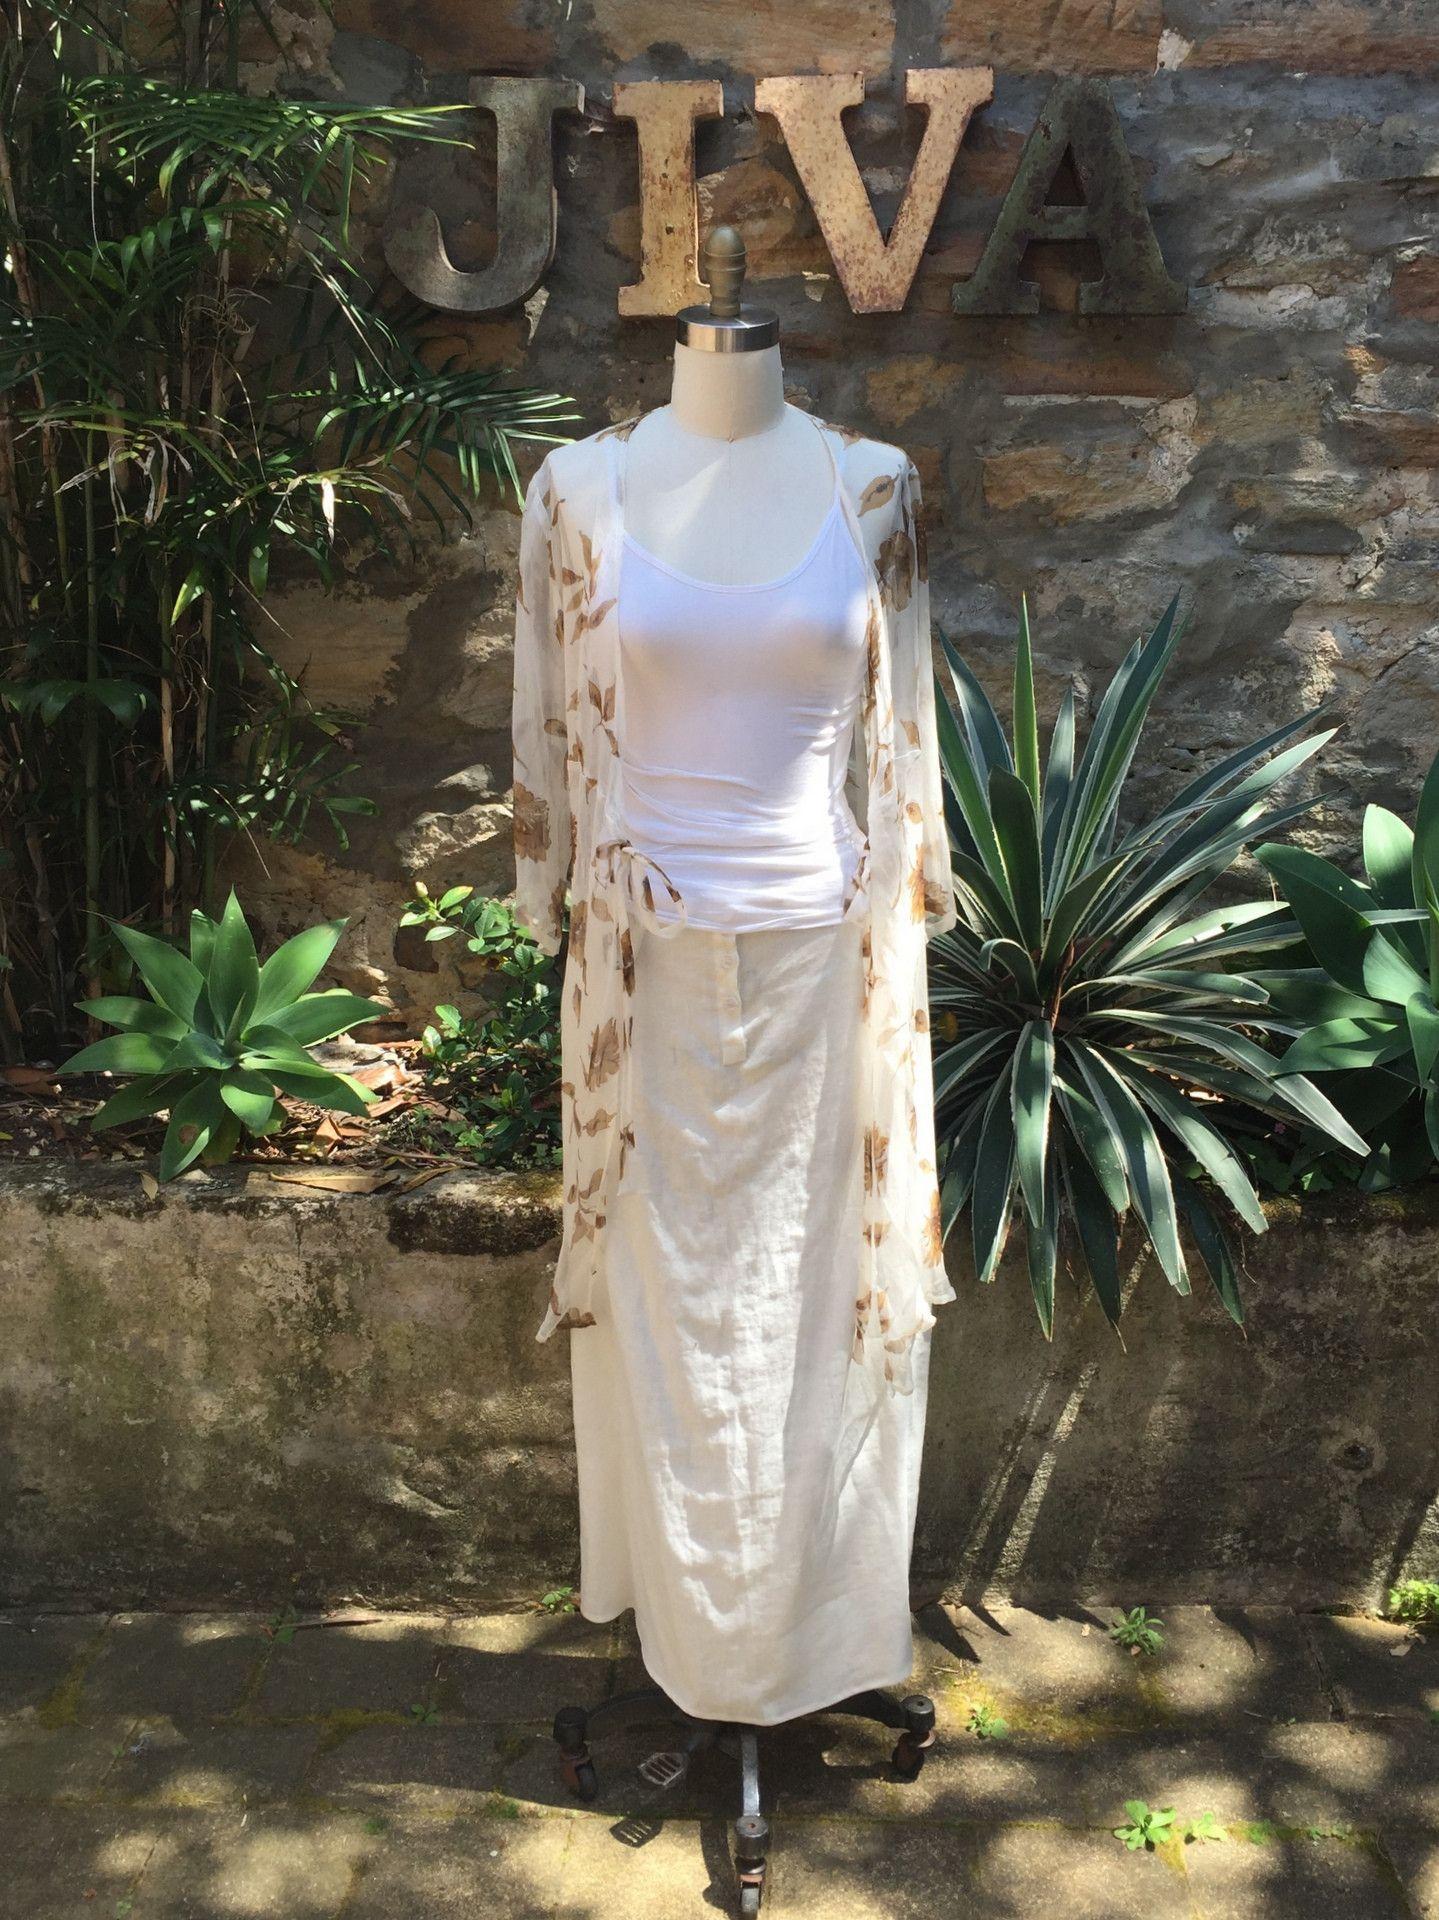 802dcdffeb Jiva Silk Georgette Wrap Dress - Ivory with Tan Flower – Jiva Clothing